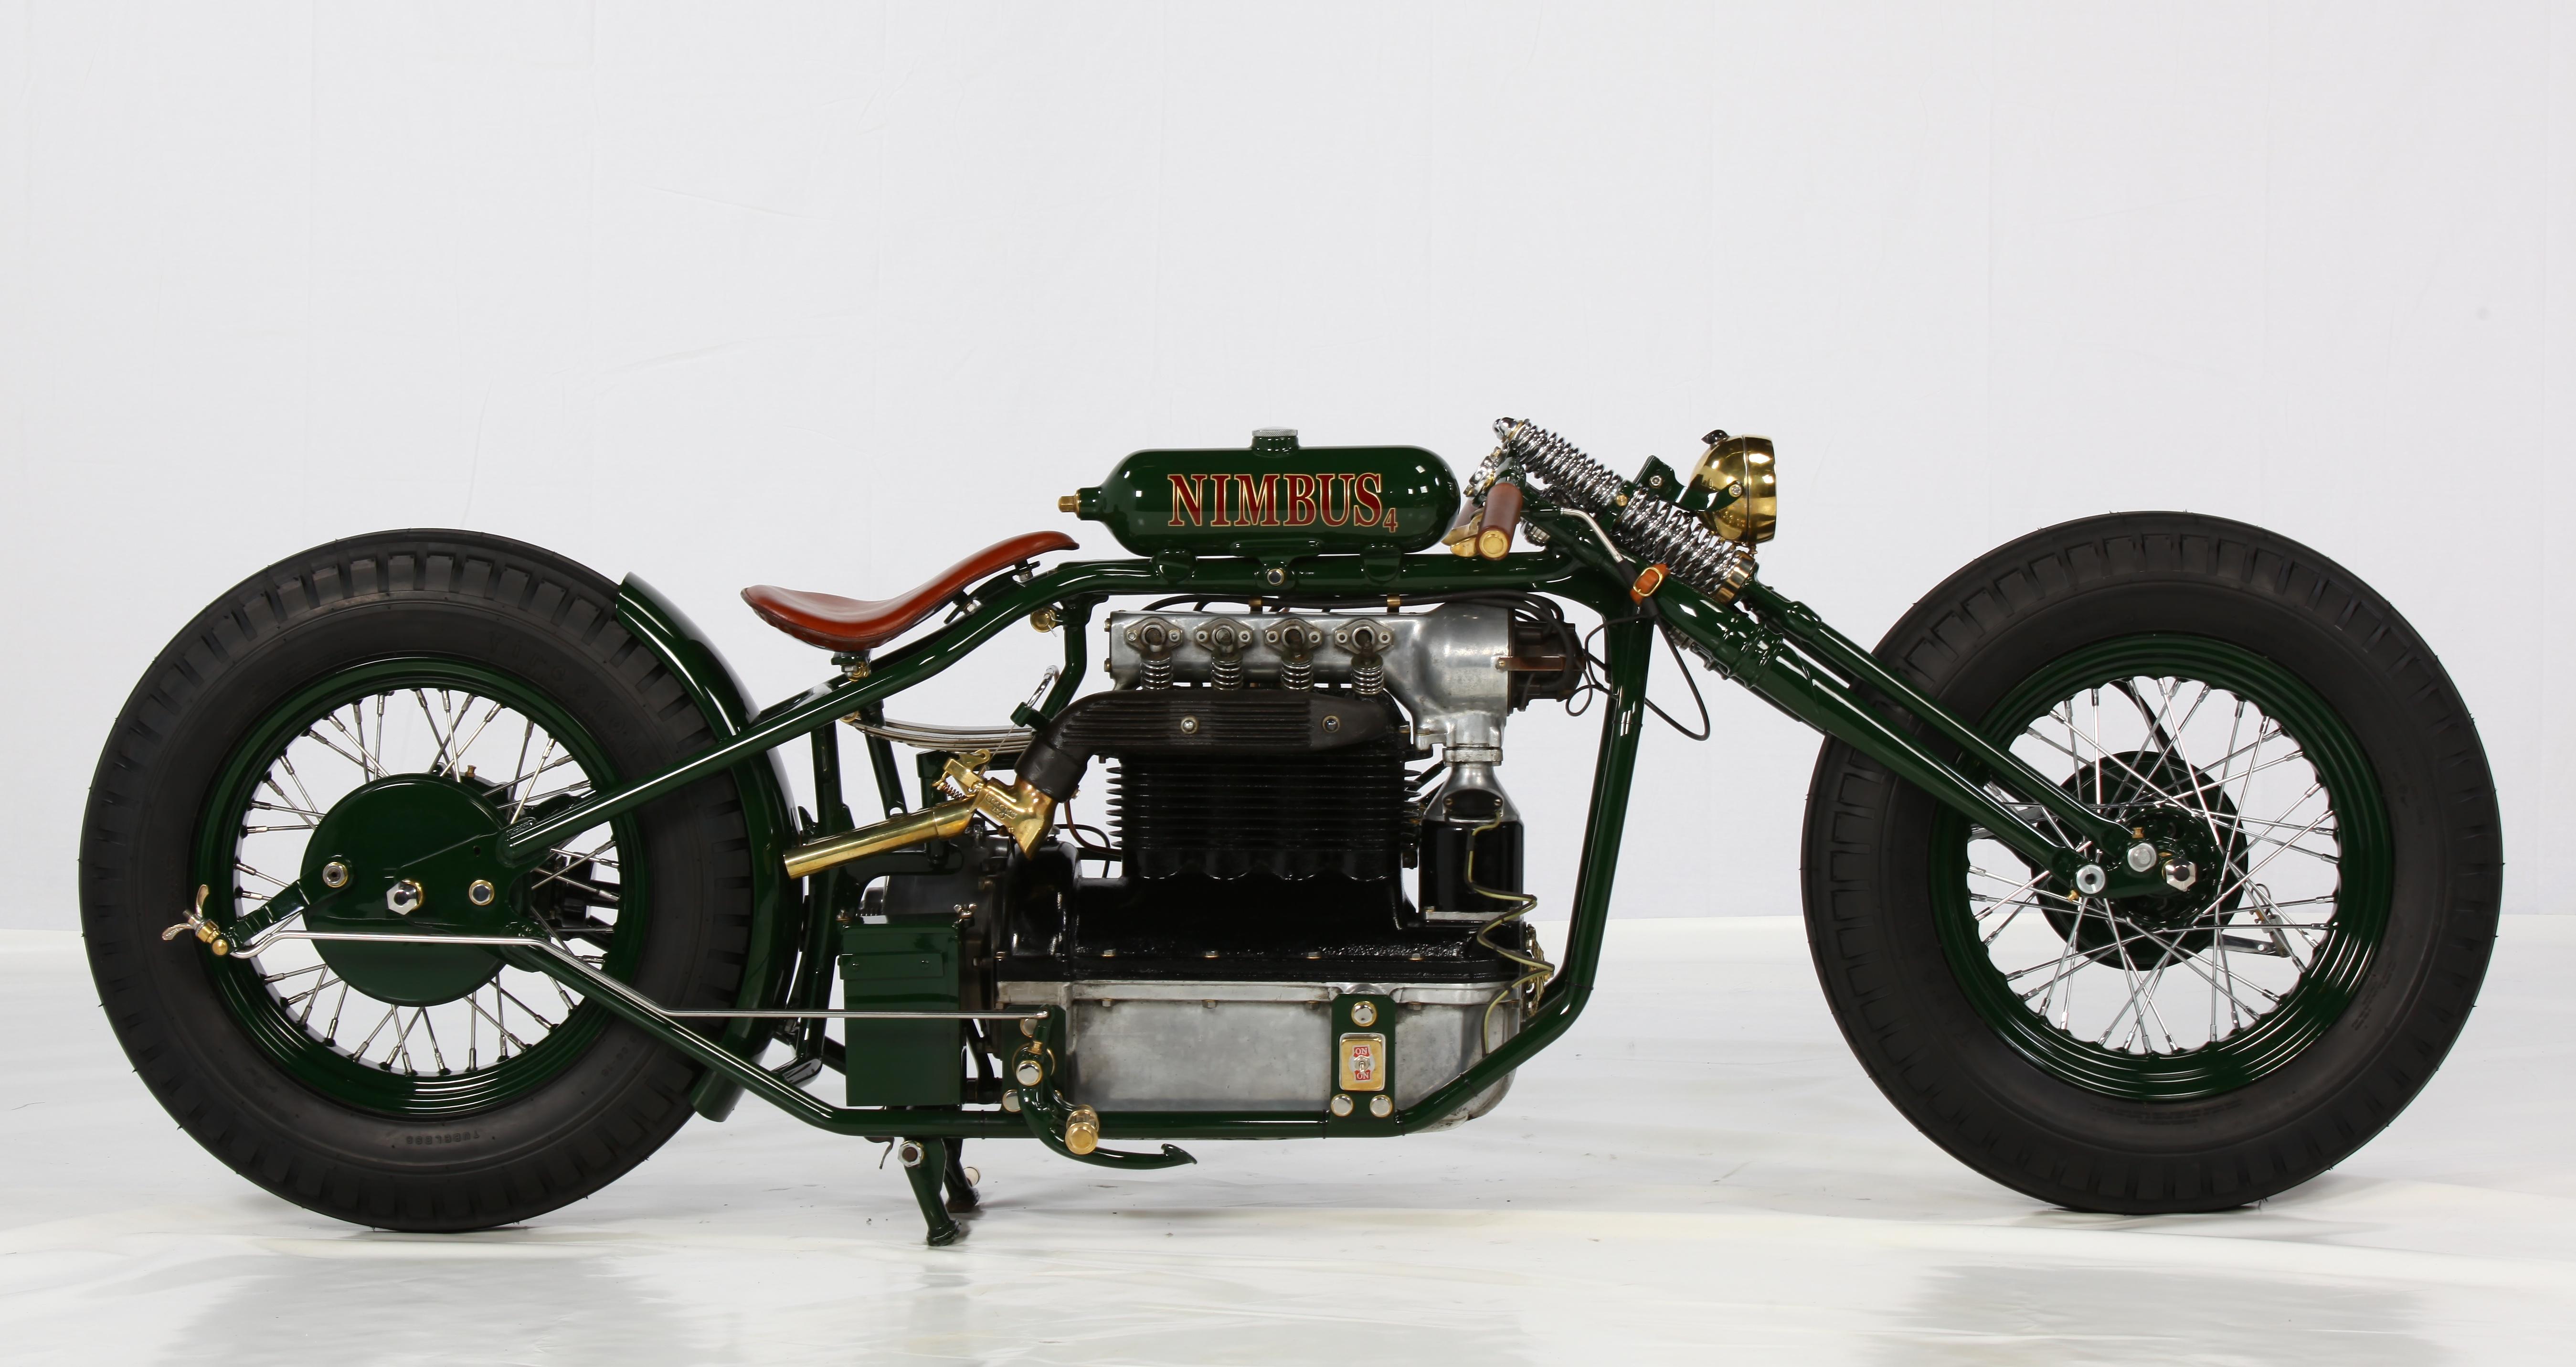 Nimbus Og 6 Cylindret Bmw Vinder Custom Bike Vm Motorrad